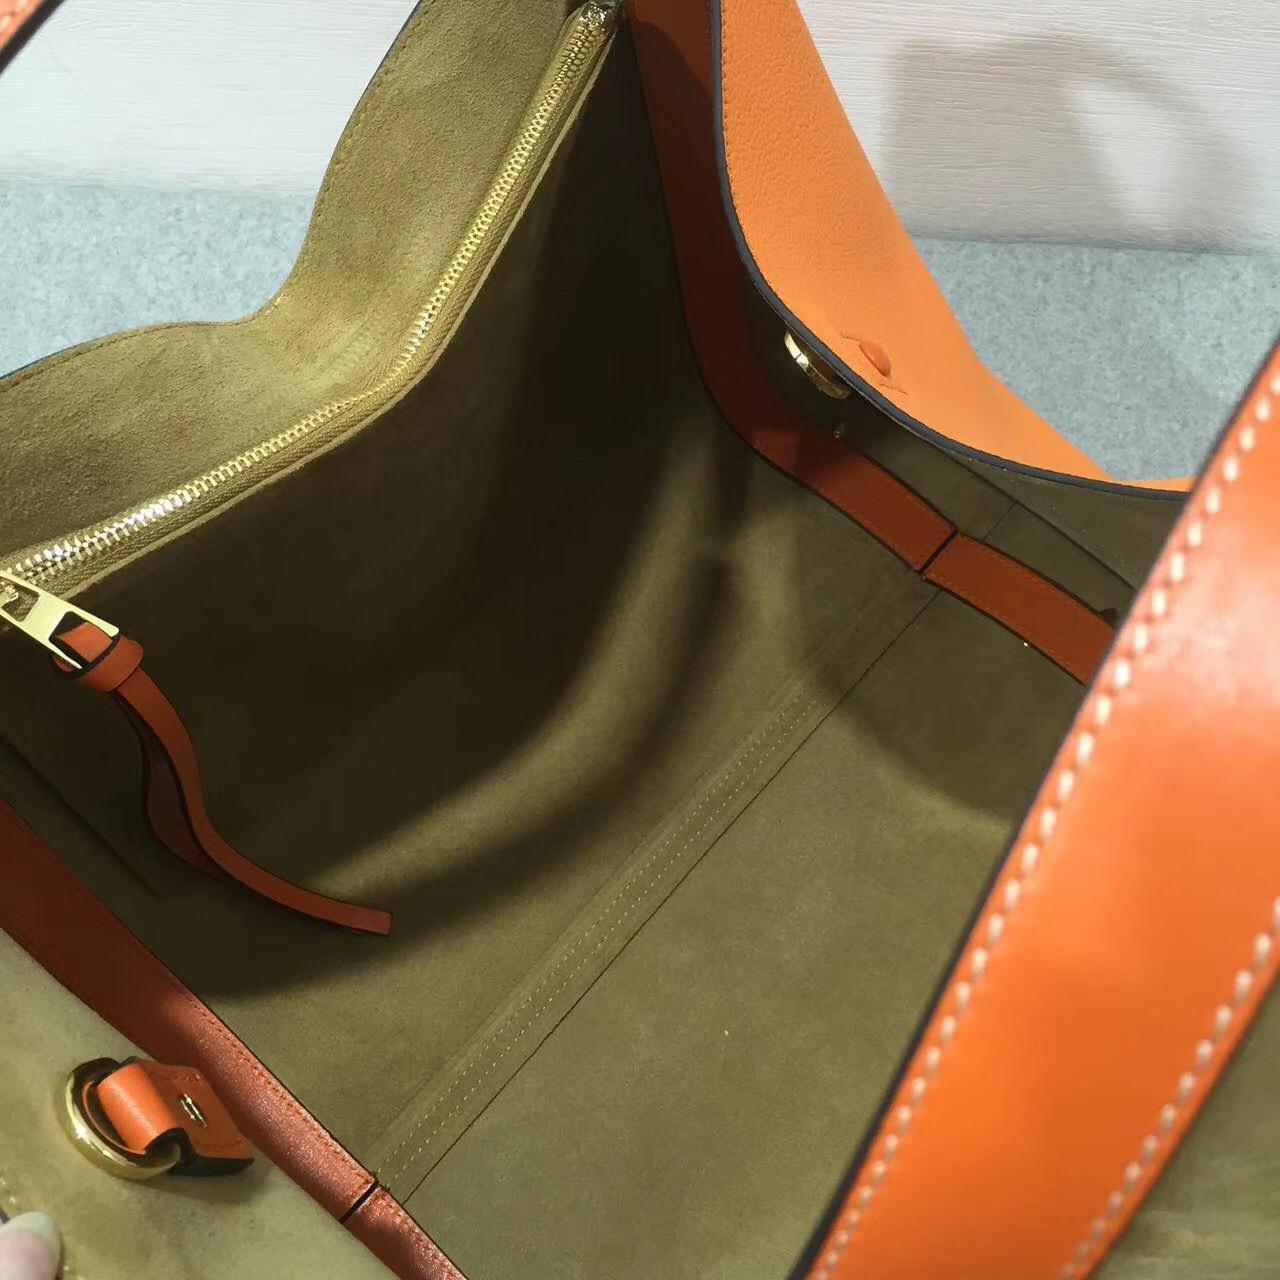 loewe羅意威巴塞羅那包 Barcelona Tote Bag 橙色日常旅行袋